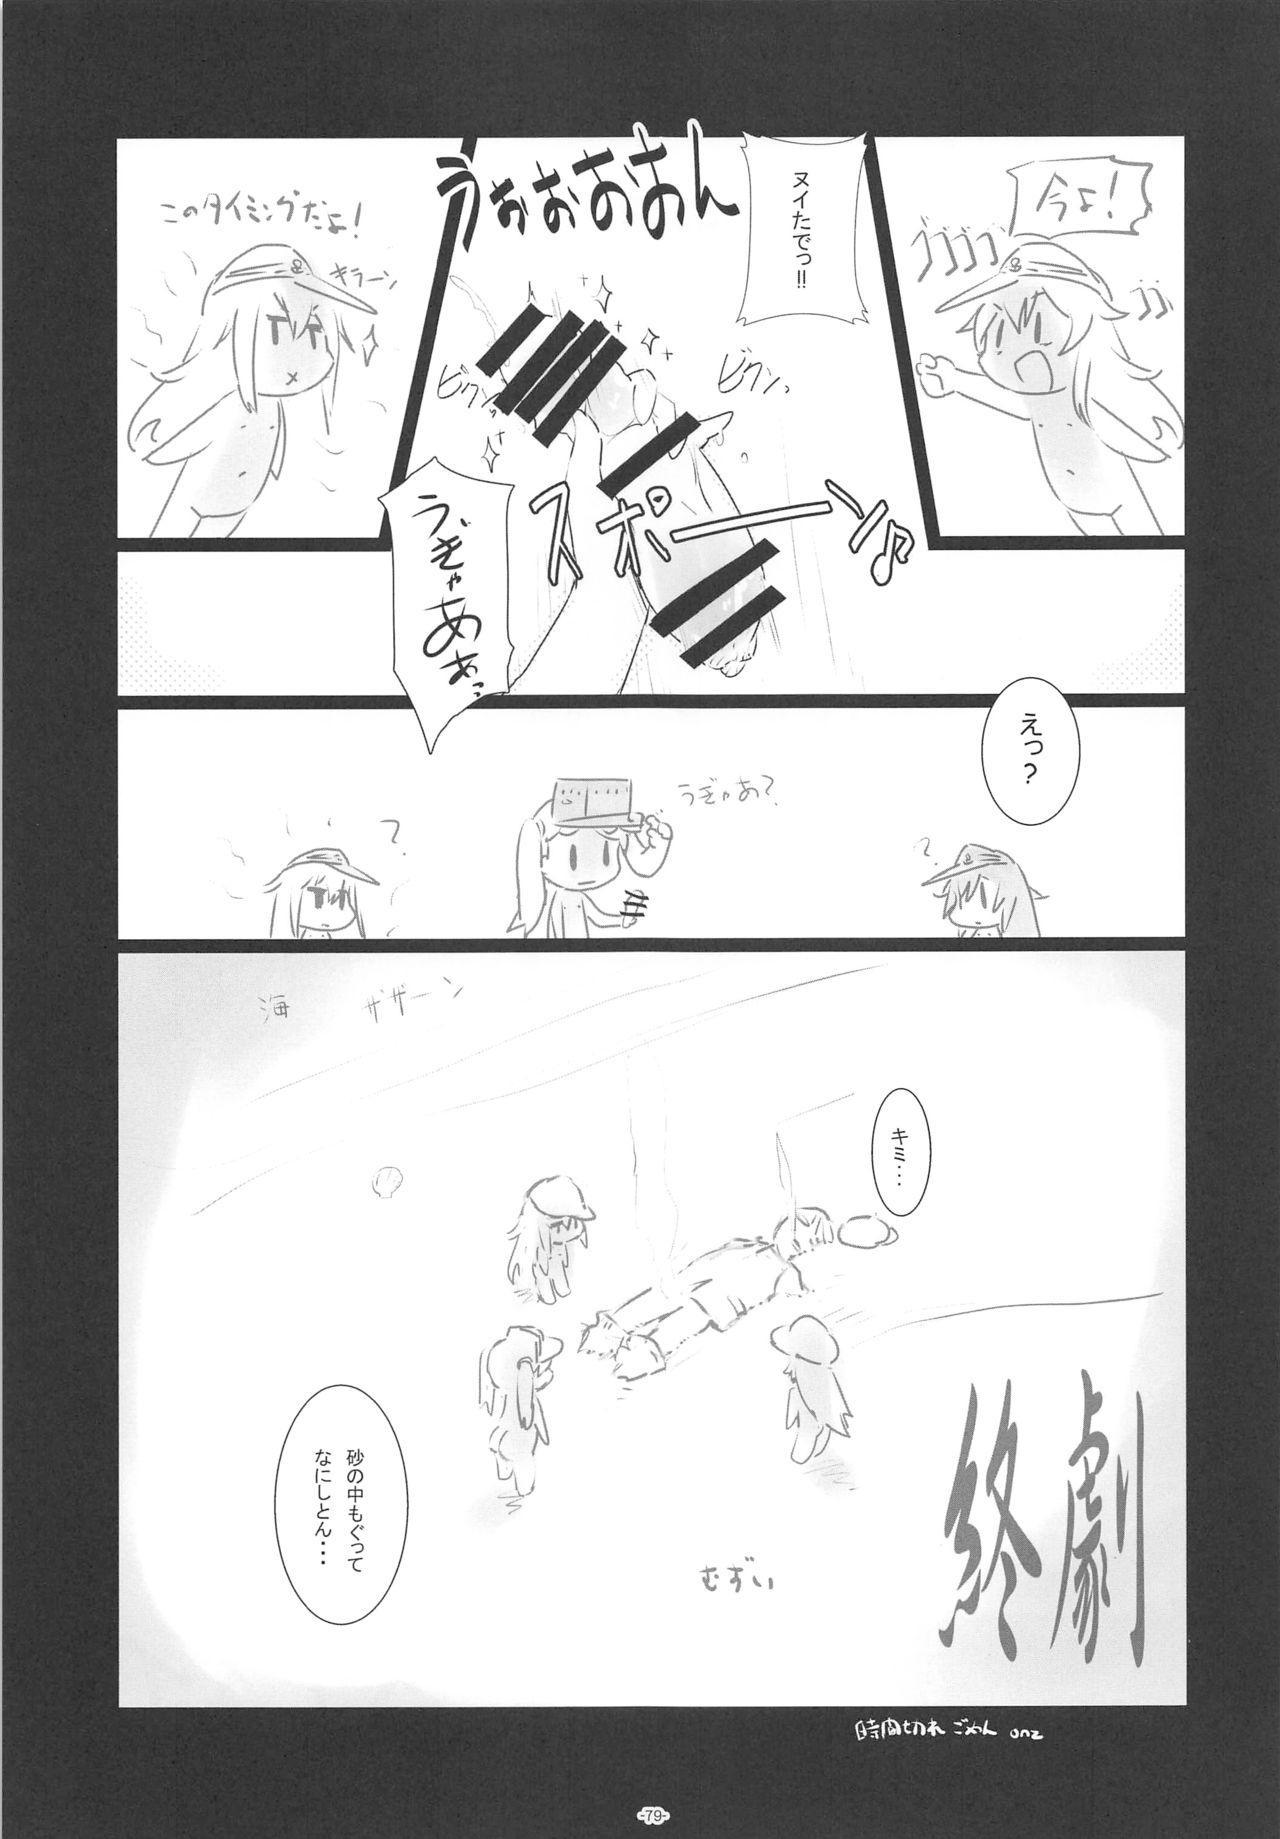 Korokoro-Manman II Korokoro:P Soushuuhen II 77